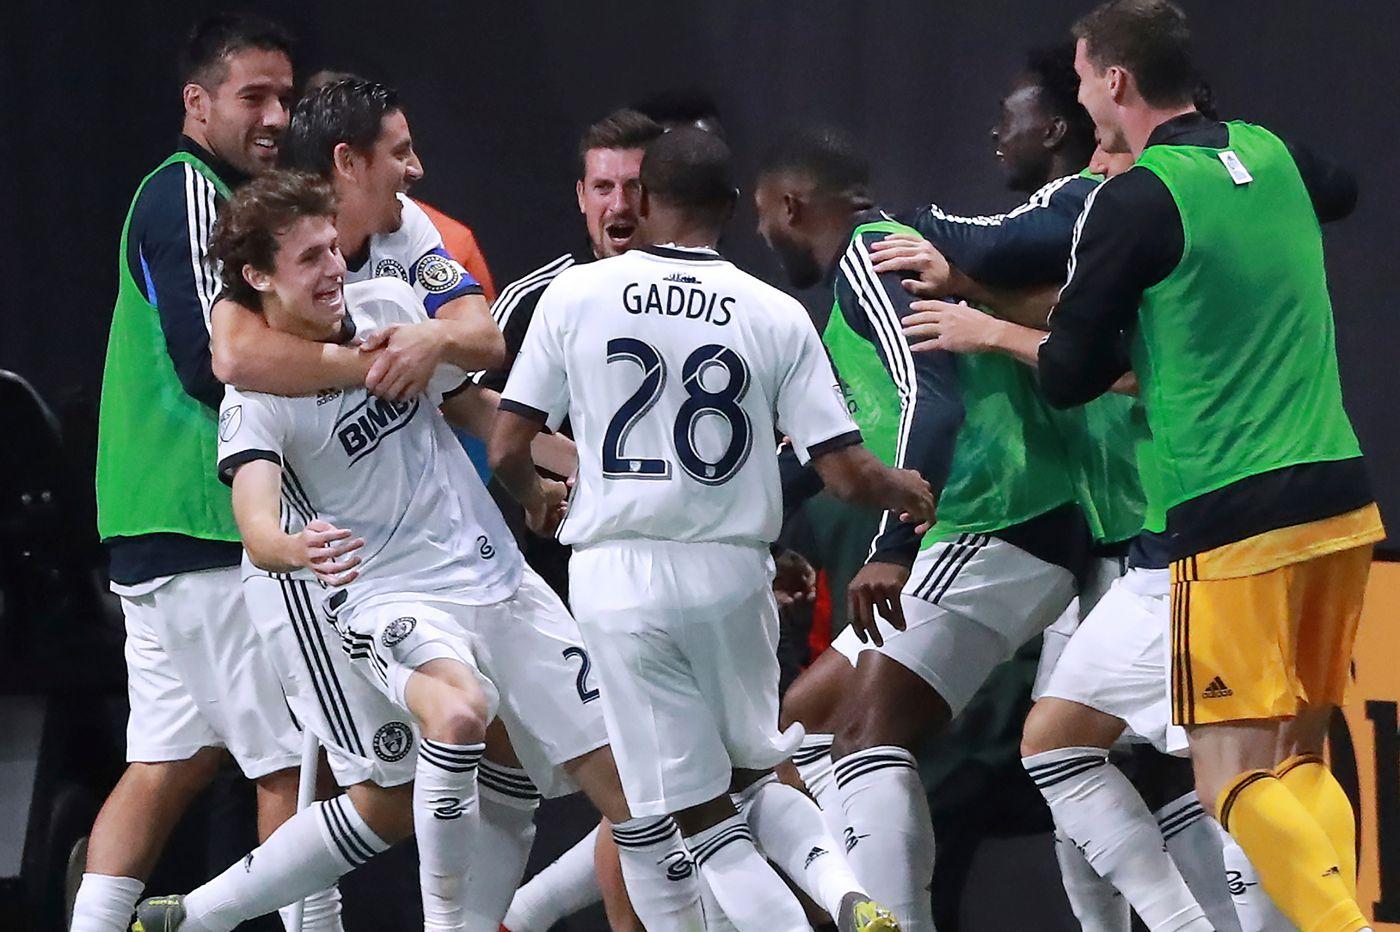 Union get 1-1 tie in Atlanta, Medford's Brenden Aaronson scores first career goal